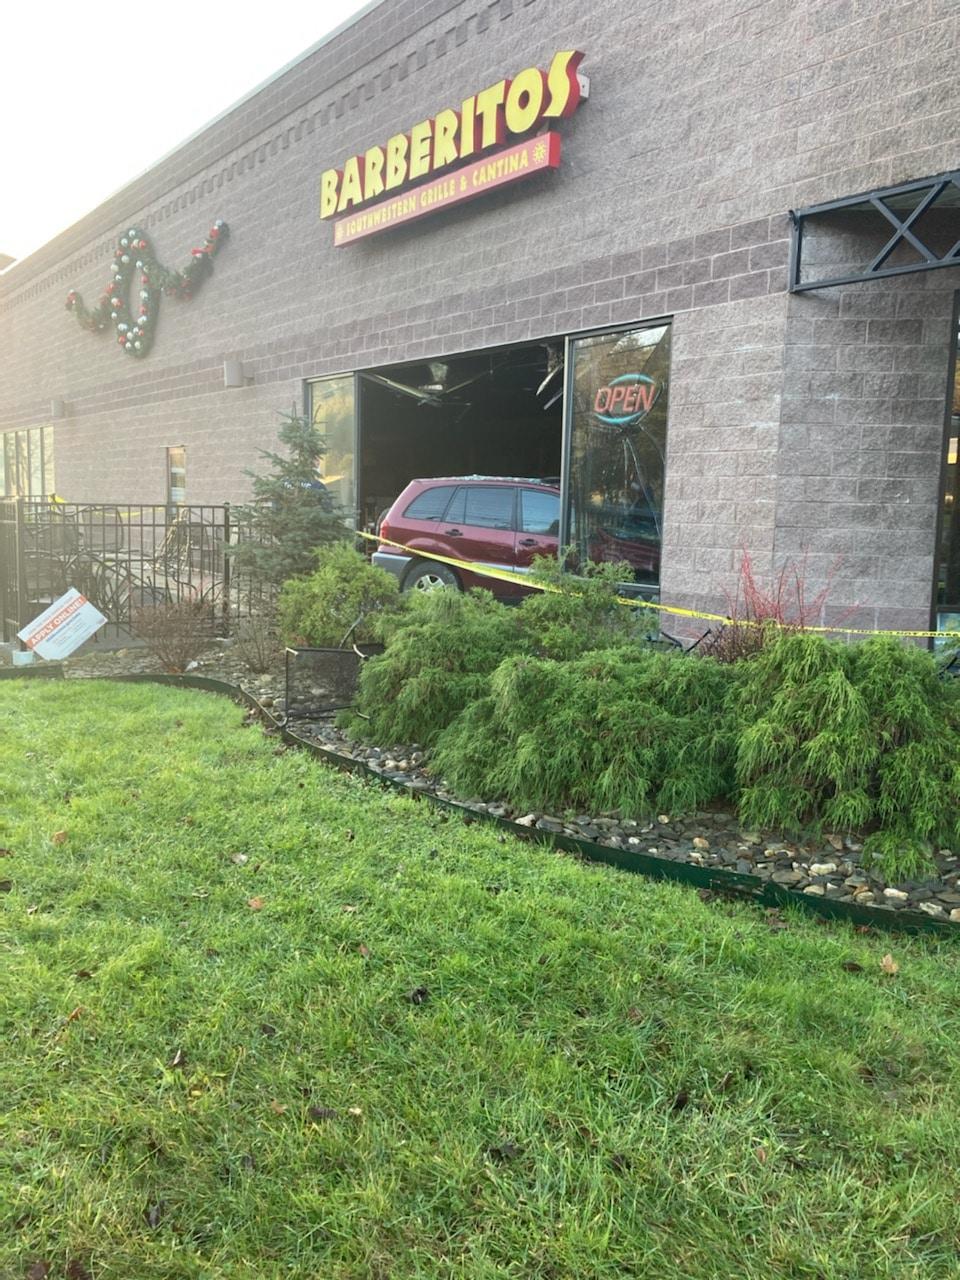 Vehicle crashes into Barberitos early Friday morning